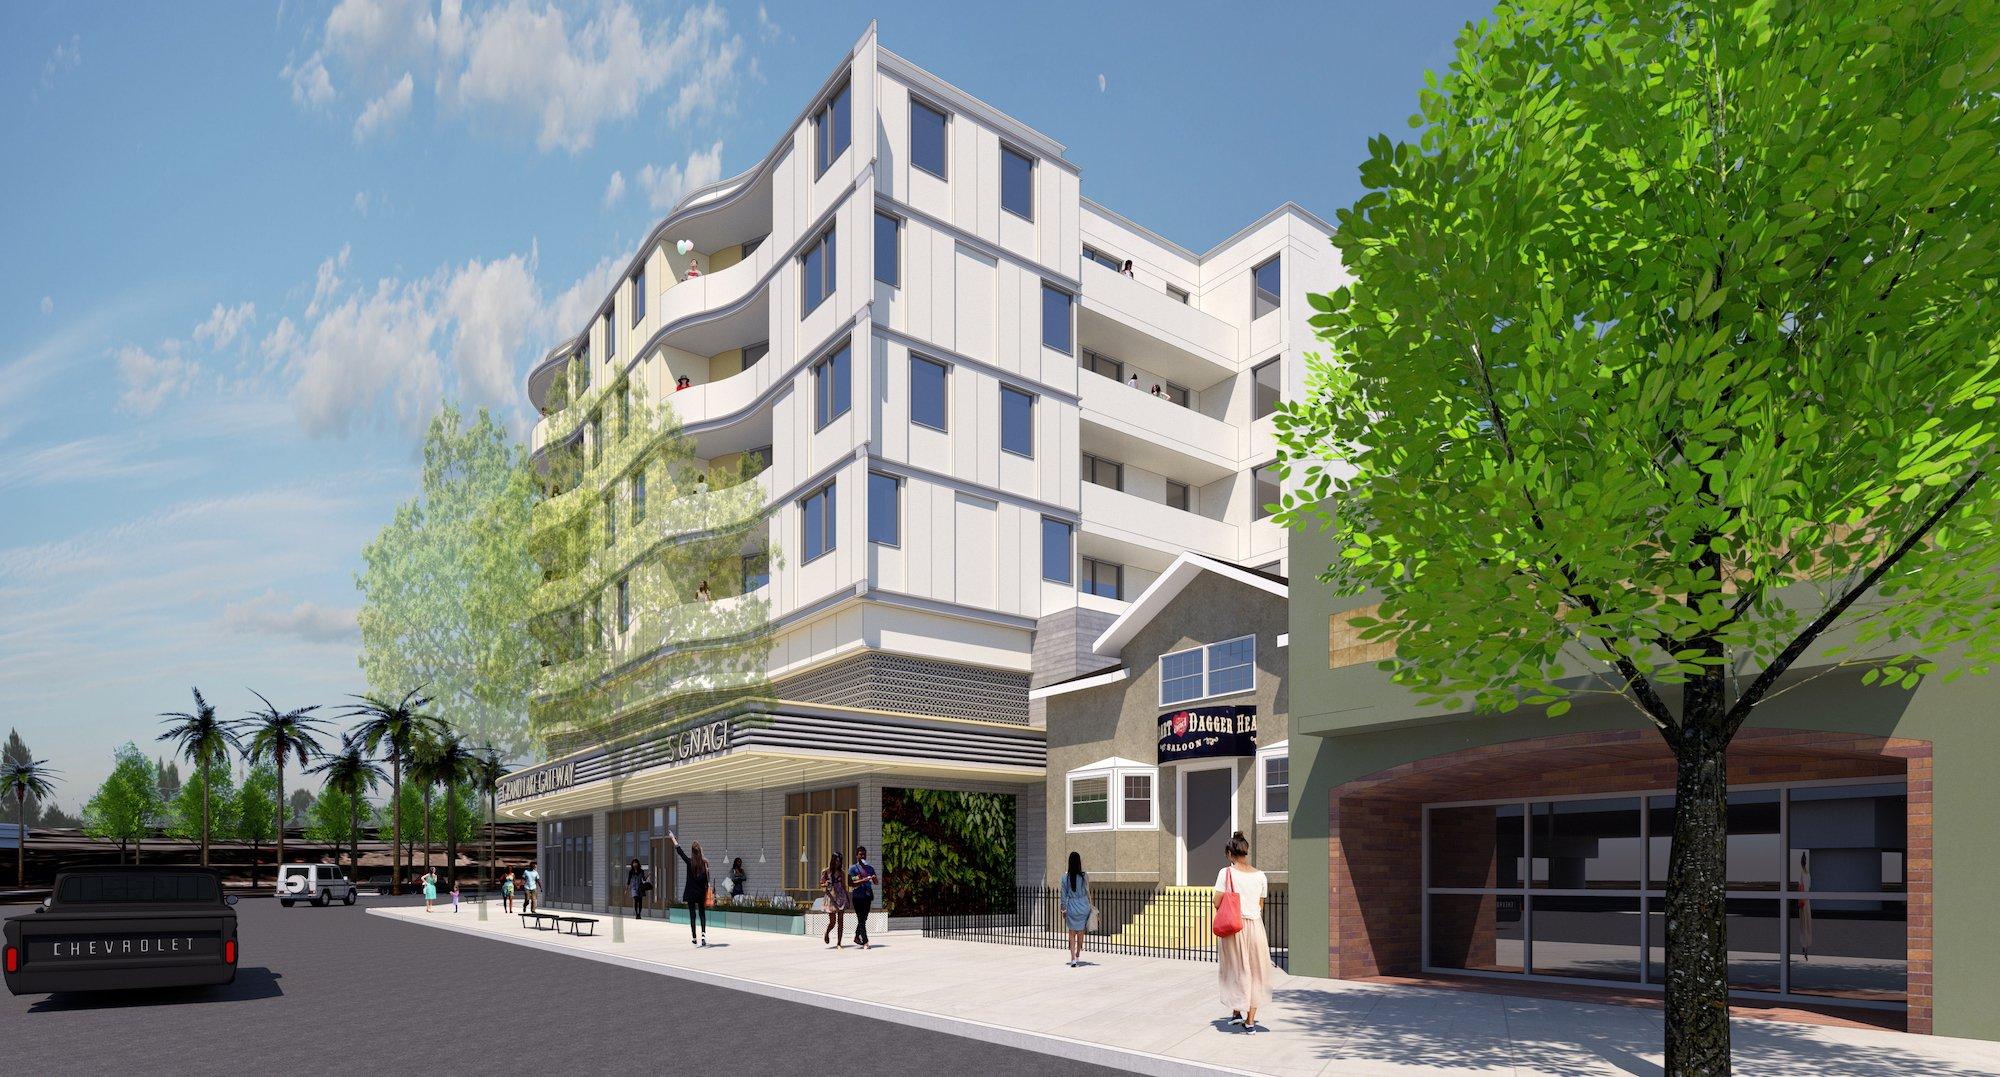 500 Lake Park-Oakland, California-Lowney Architecture-1